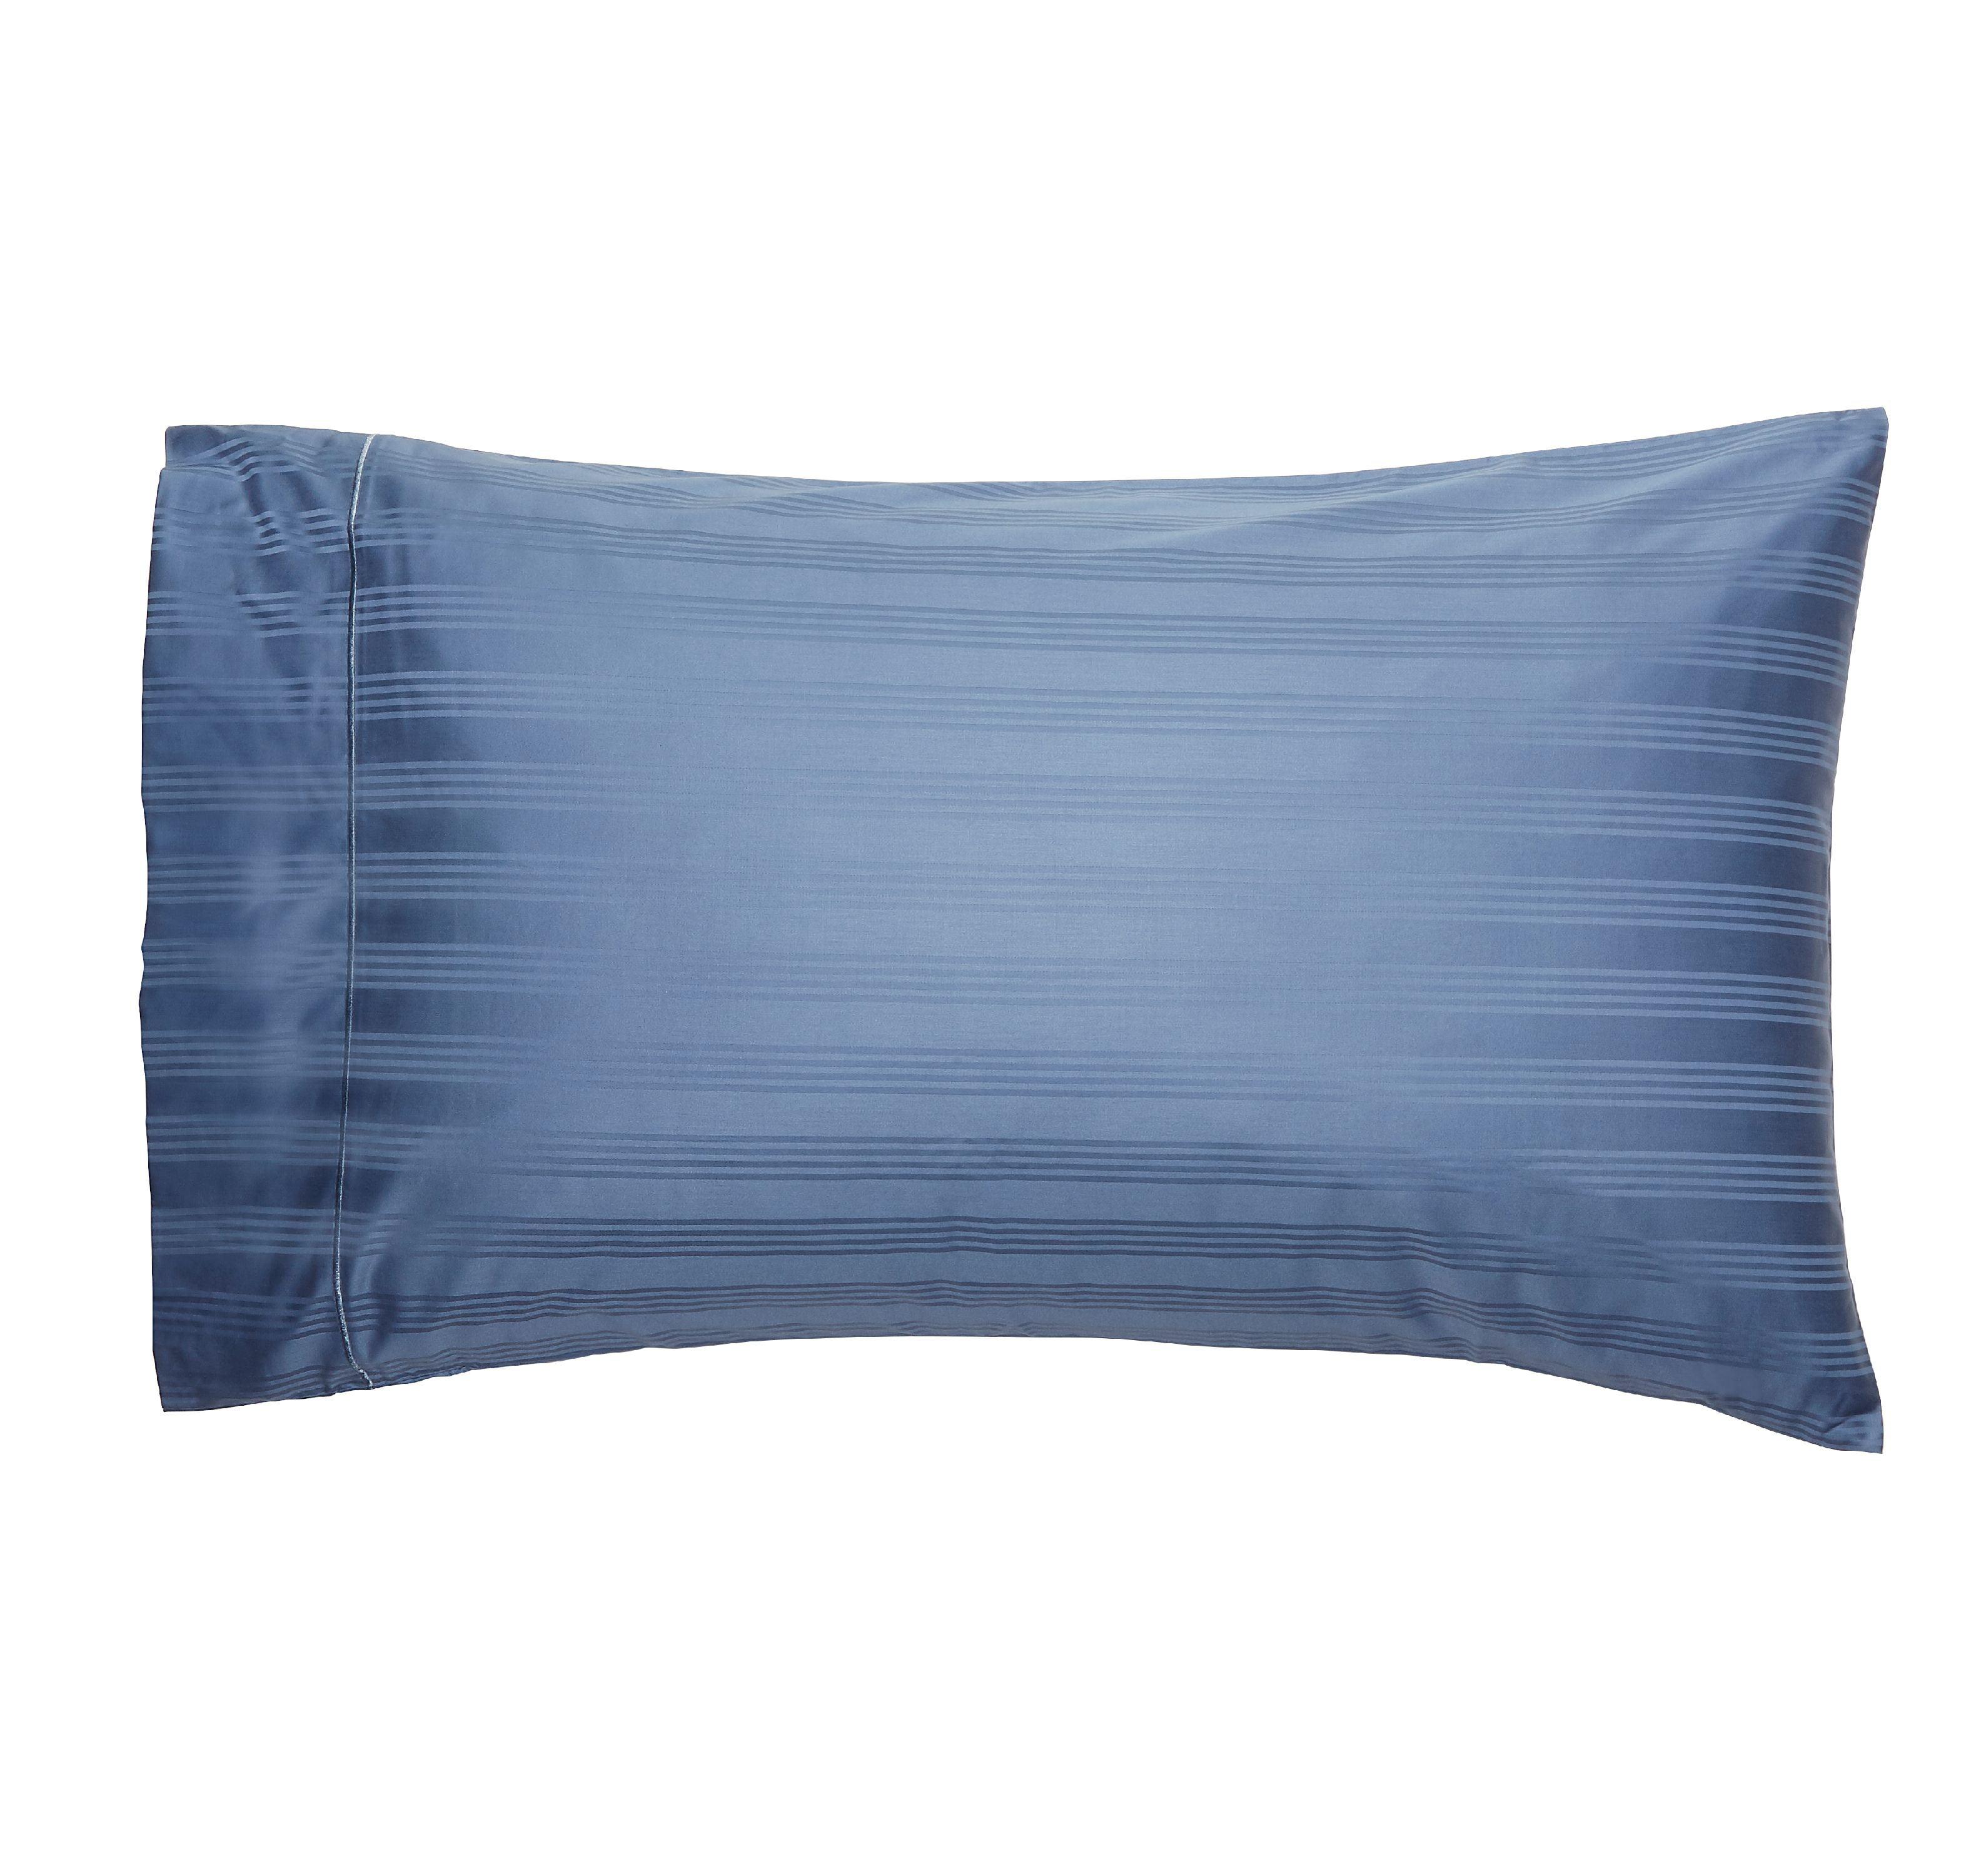 Better Home and Gardens 400-Thread-Count Damask Performance Standard/Queen Pillowcases, Set of 2, Blue Moonlight